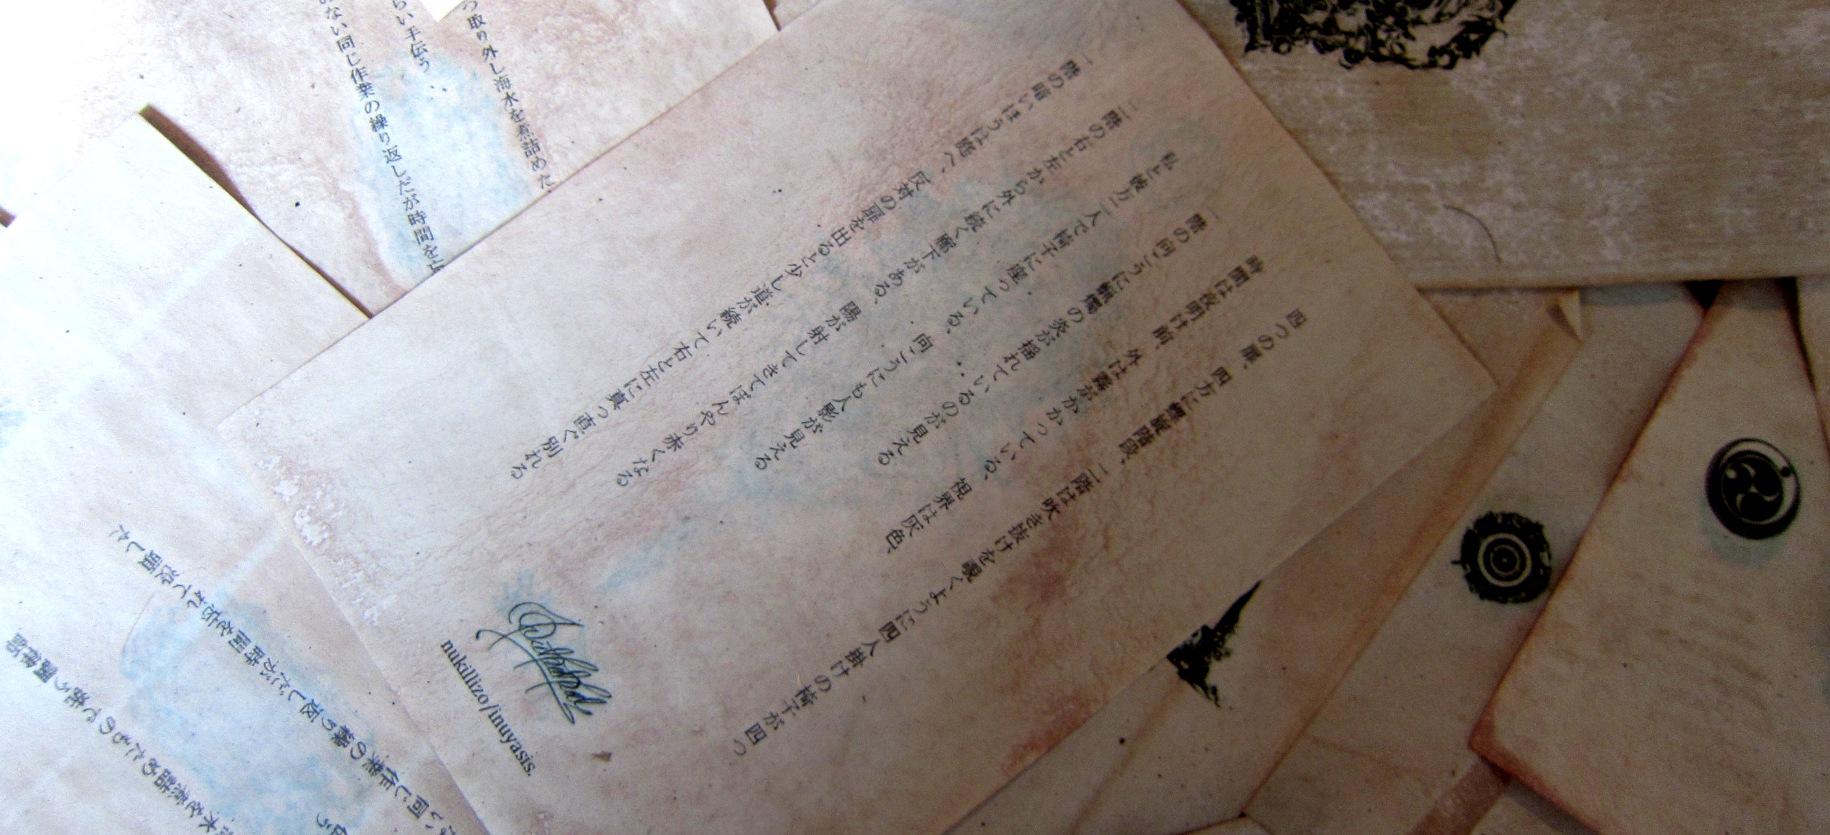 2047)「NUKILLIZO 展 【POOL】」 ニュー・スター 5月2 日(木)~5月12日(日)_f0126829_7394177.jpg